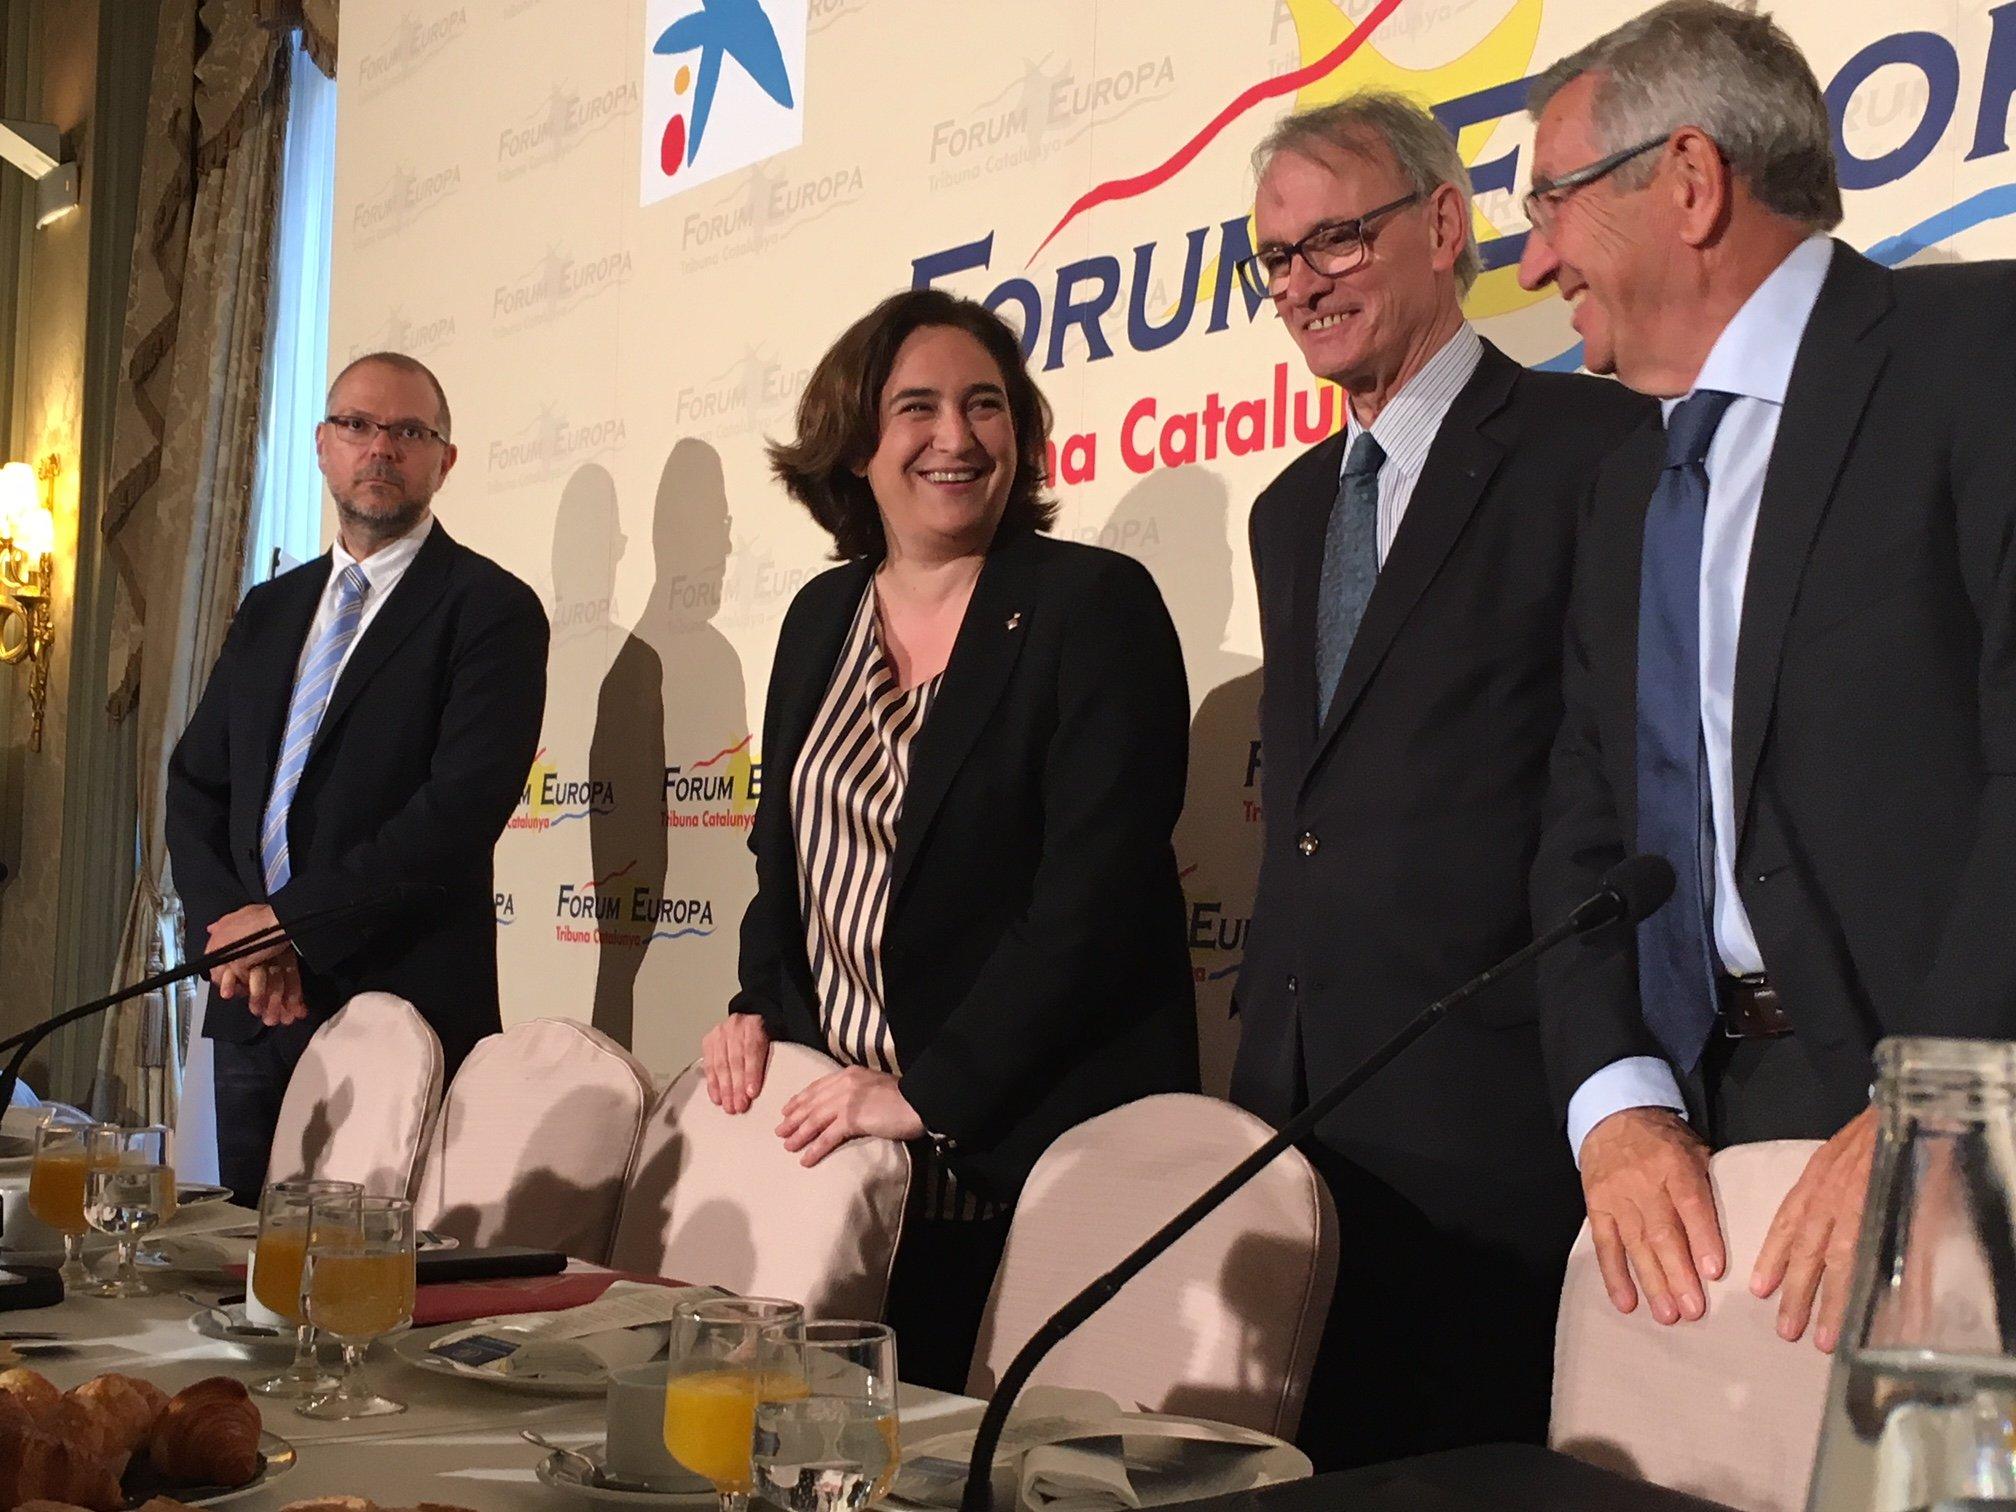 colau forum europa gisela rodriguez